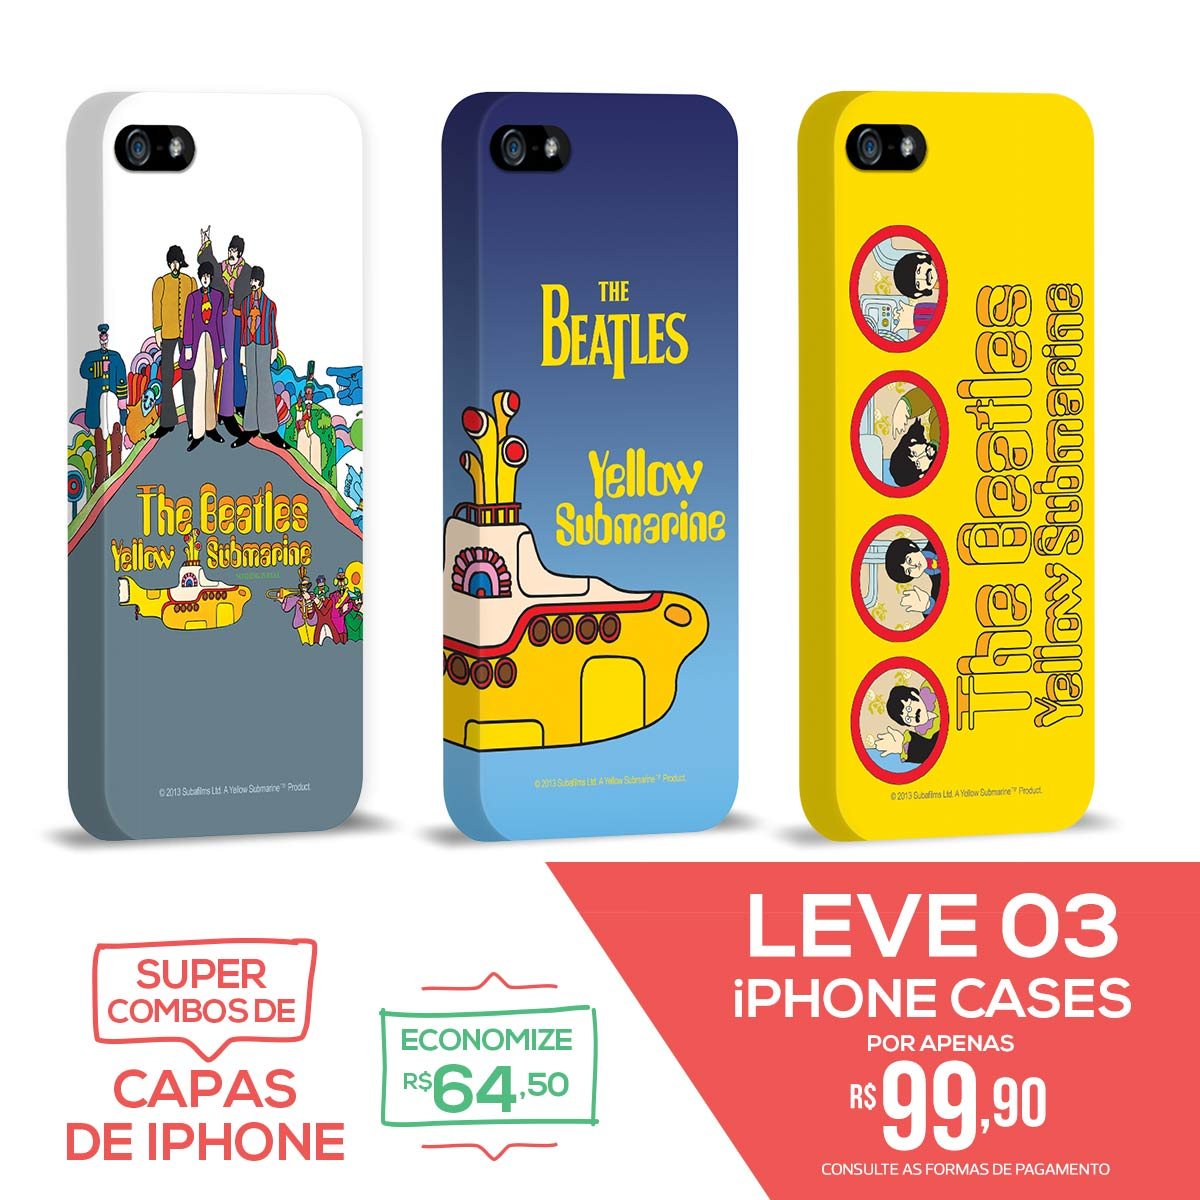 Kit Com 3 Capas de iPhone 5/5S The Beatles Yellow Submarine